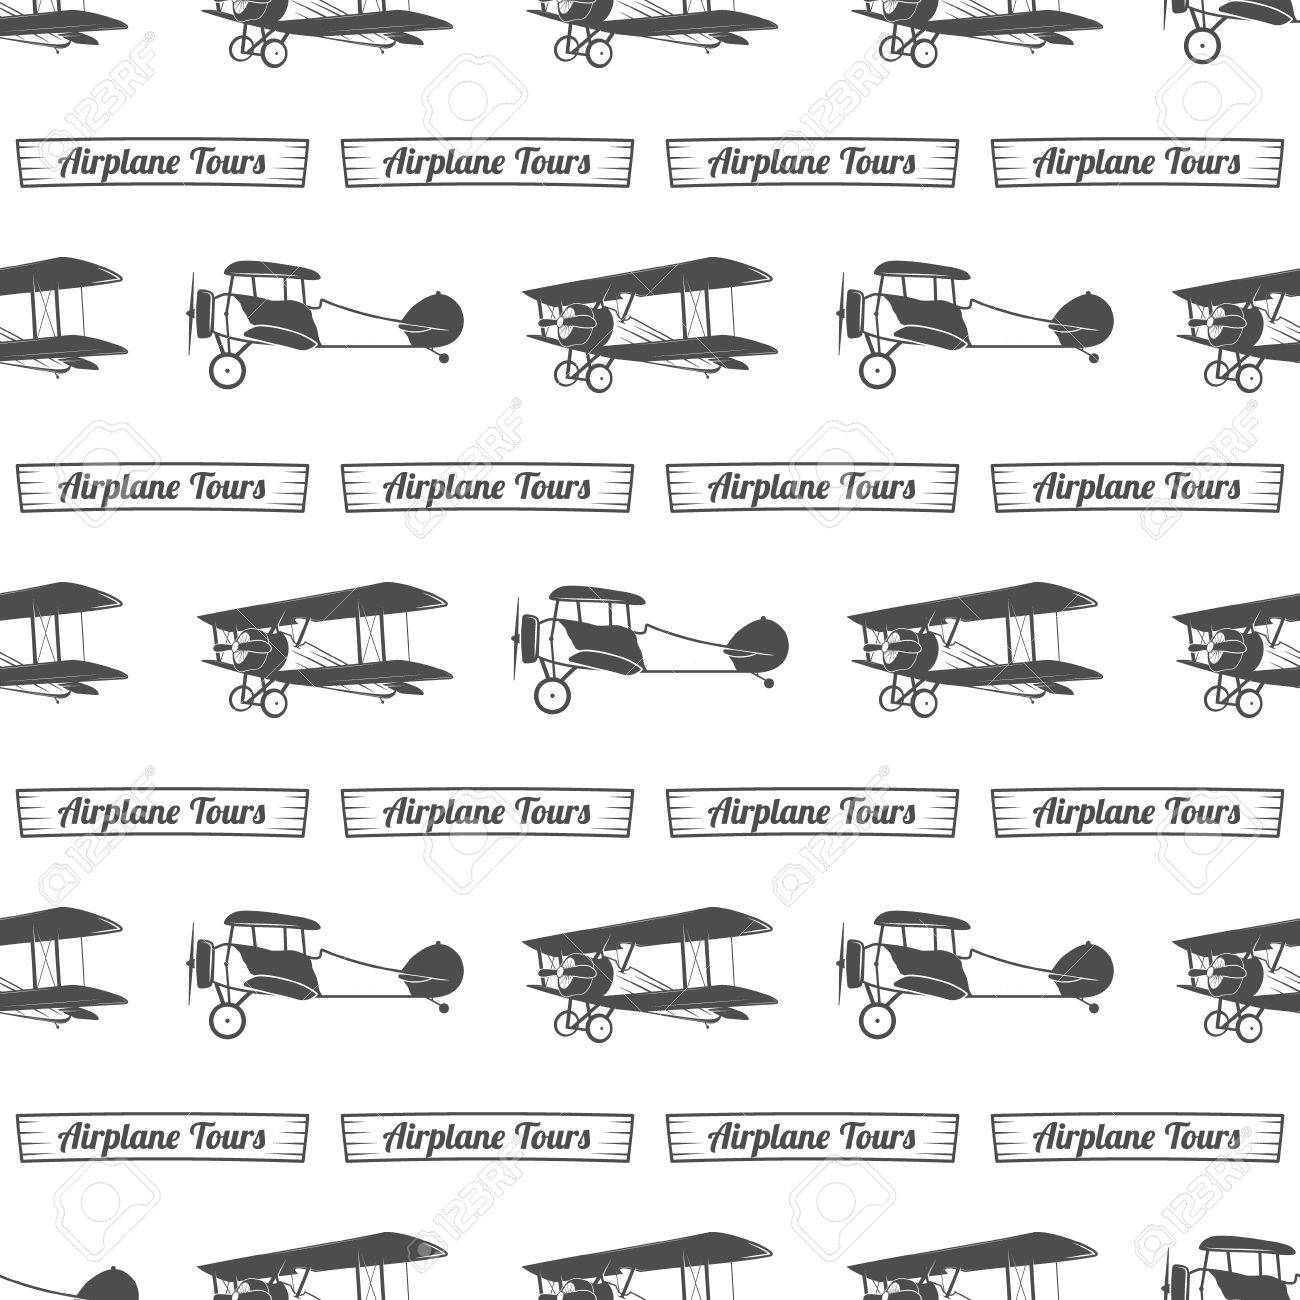 Vintage Airplane Tour Pattern Old Biplanes Seamless Background